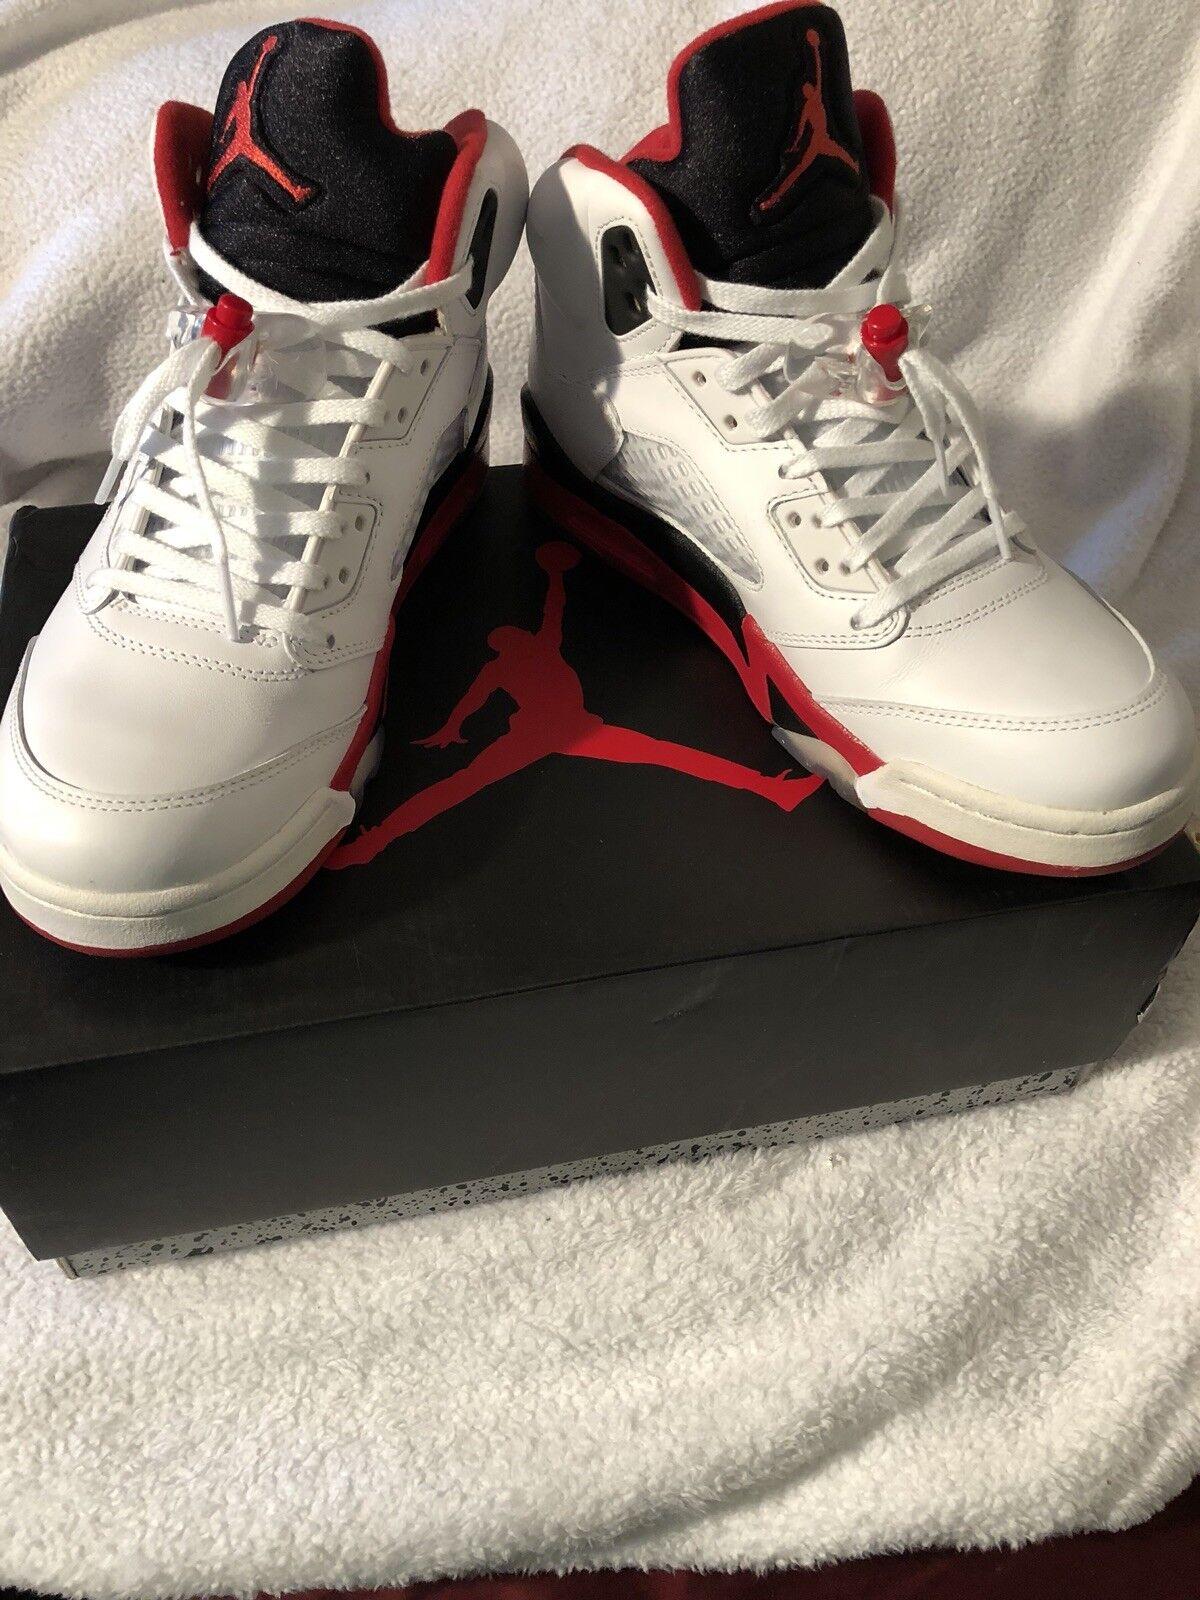 Nike Air Jordan V 5 Retro Size 7.5 White Red Black 136027-162